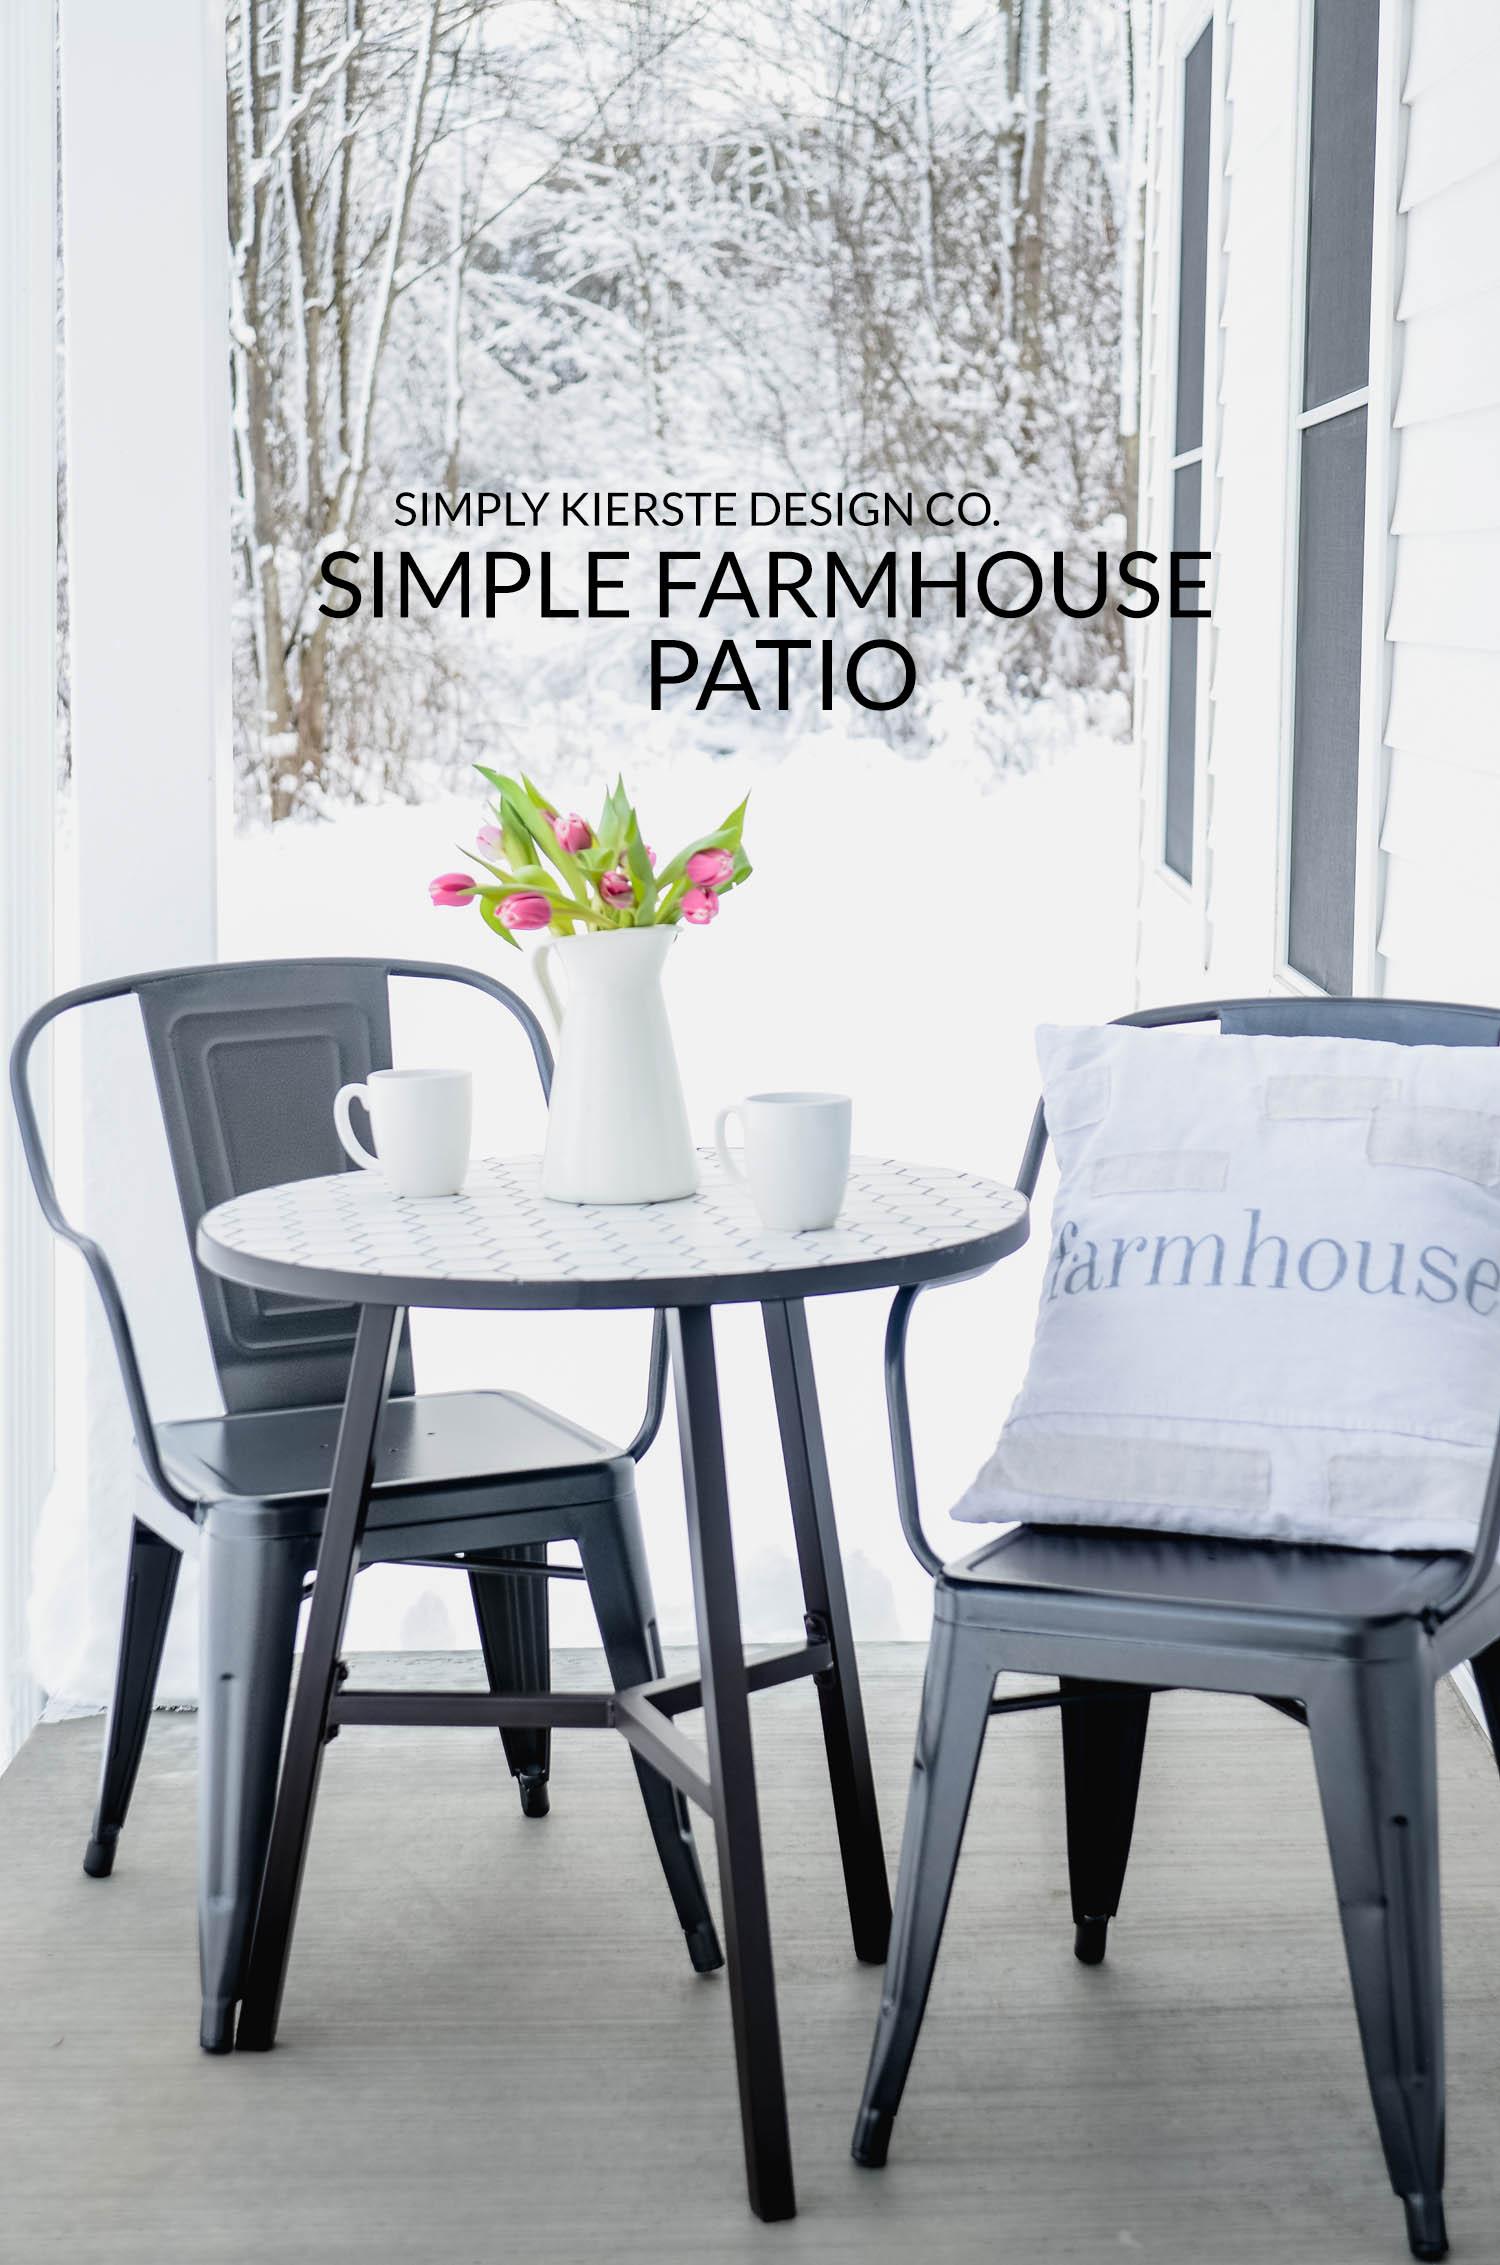 Simple Farmhouse Patio | Cozy Front Porch | oldsaltfarm.com #farmhouse #farmhousestyle #outdoorentertaining #patiofurniture